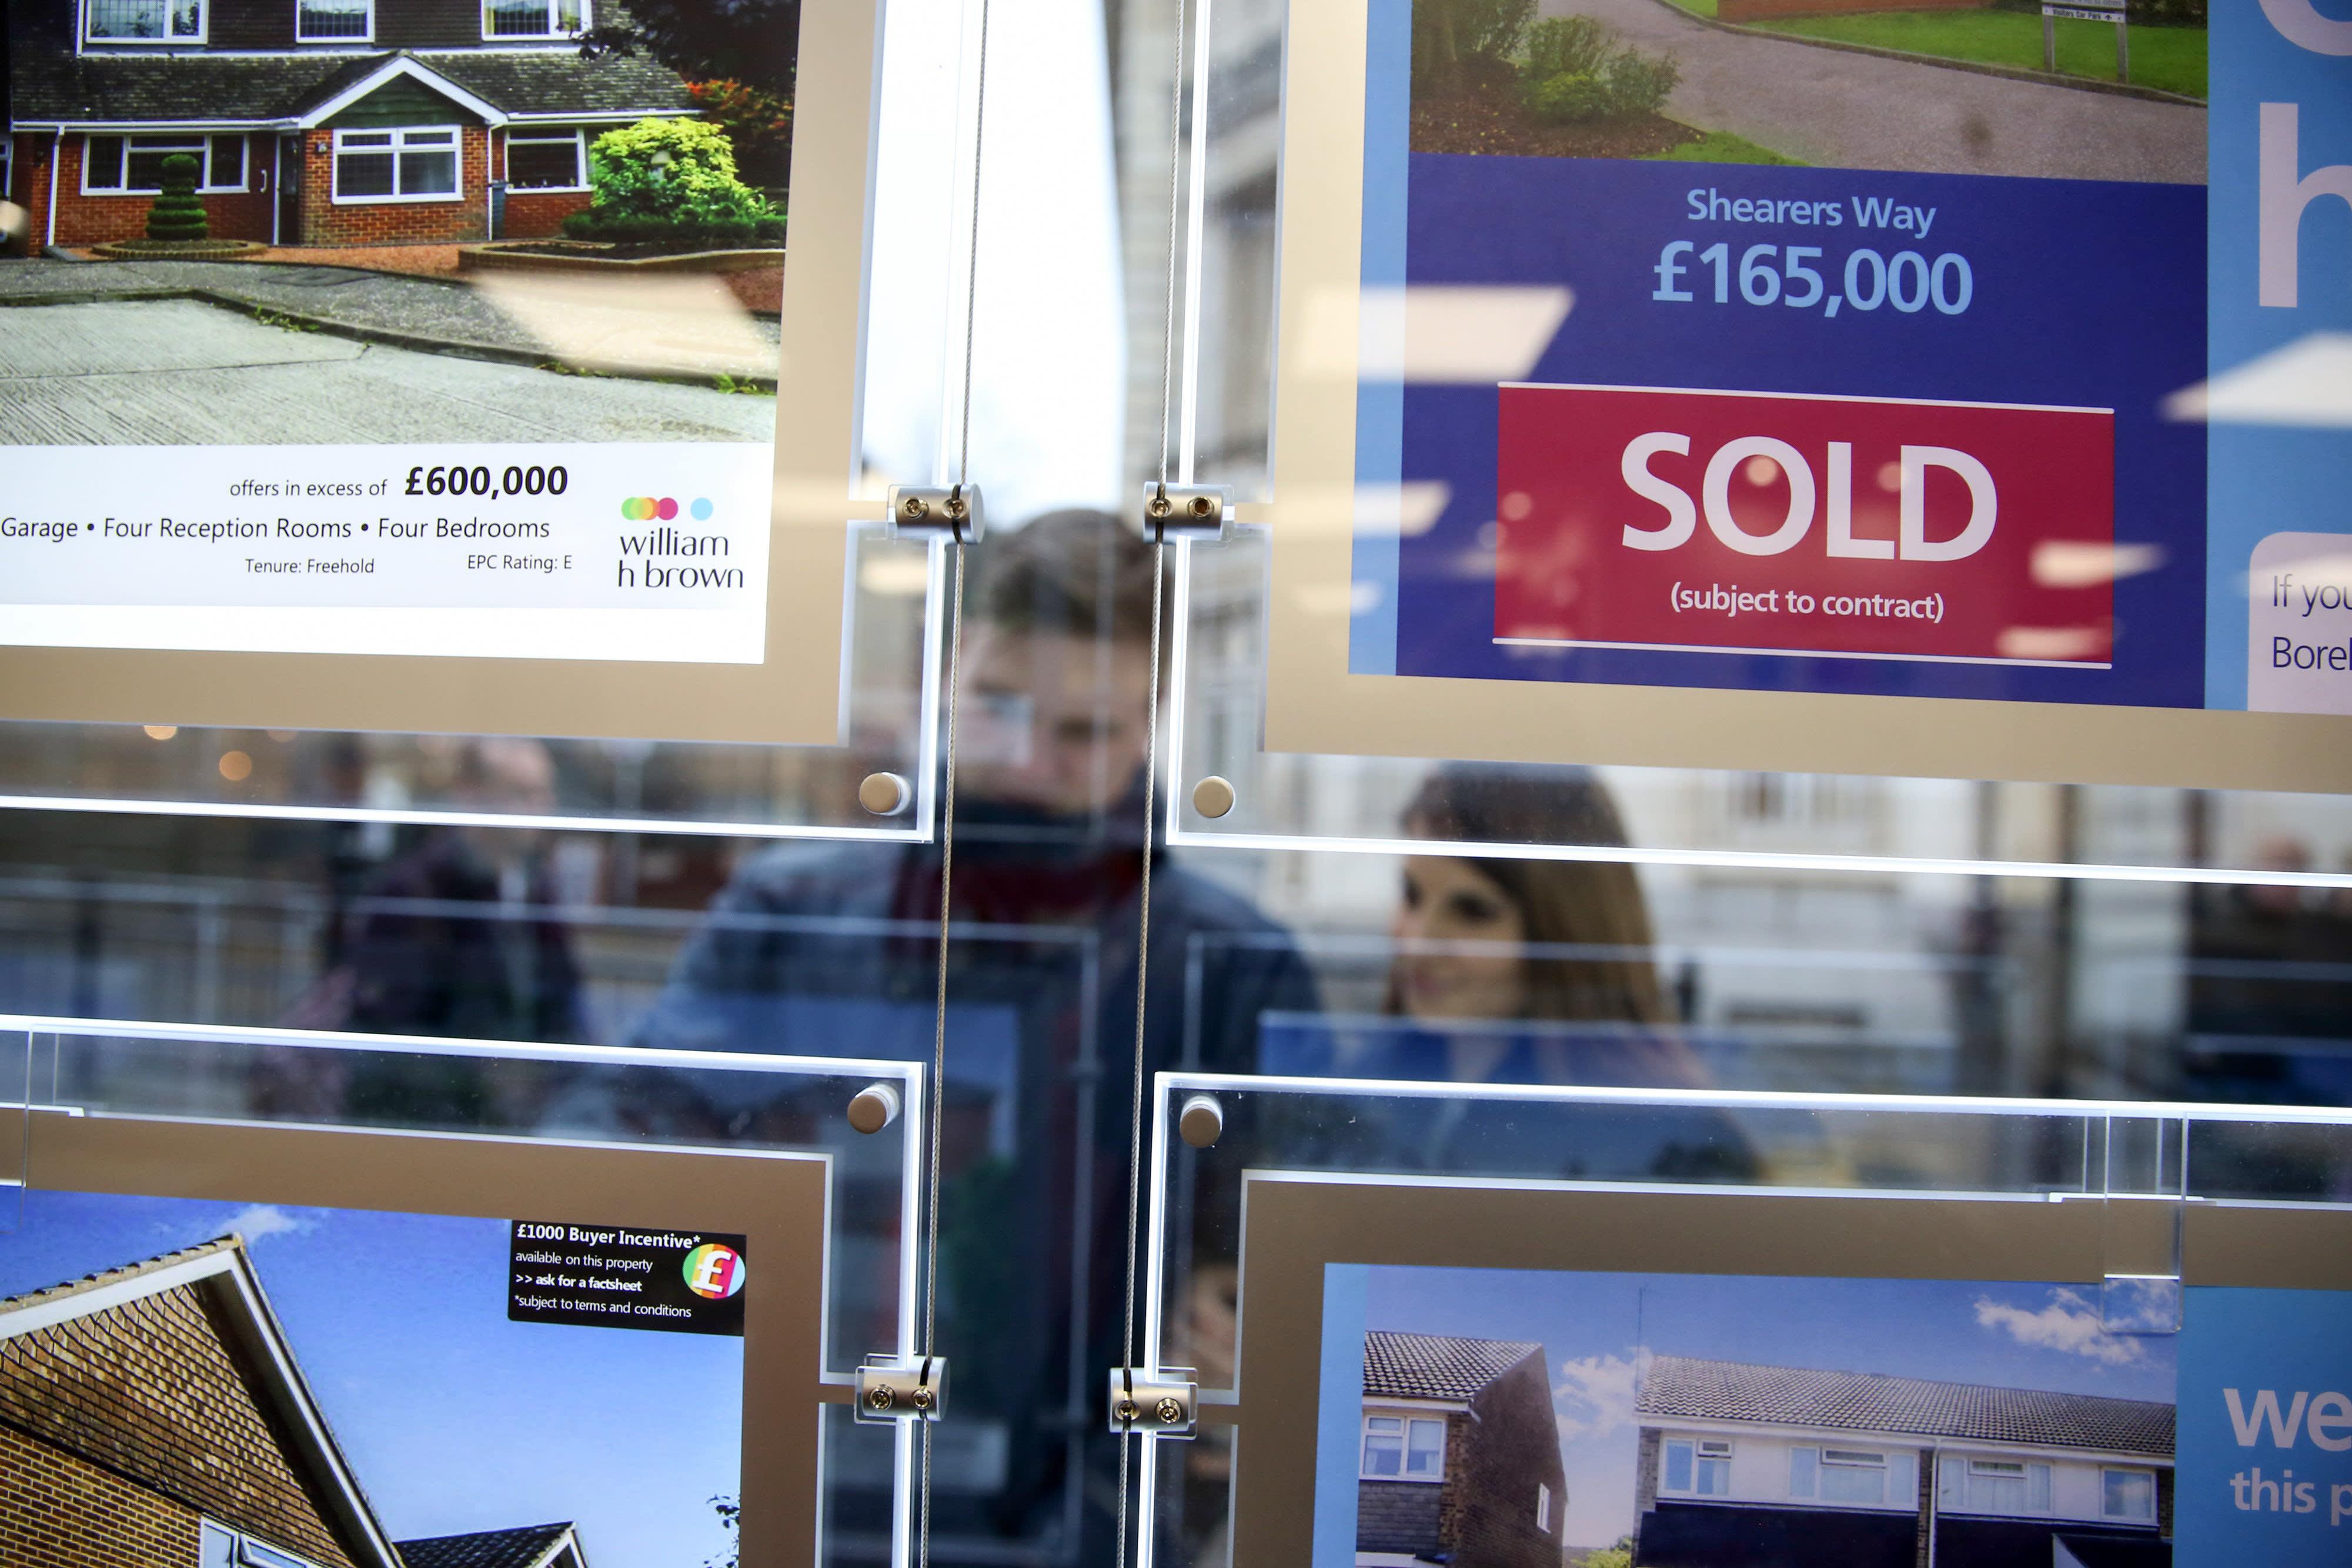 Landlords urge govt to 'get housing reform right'